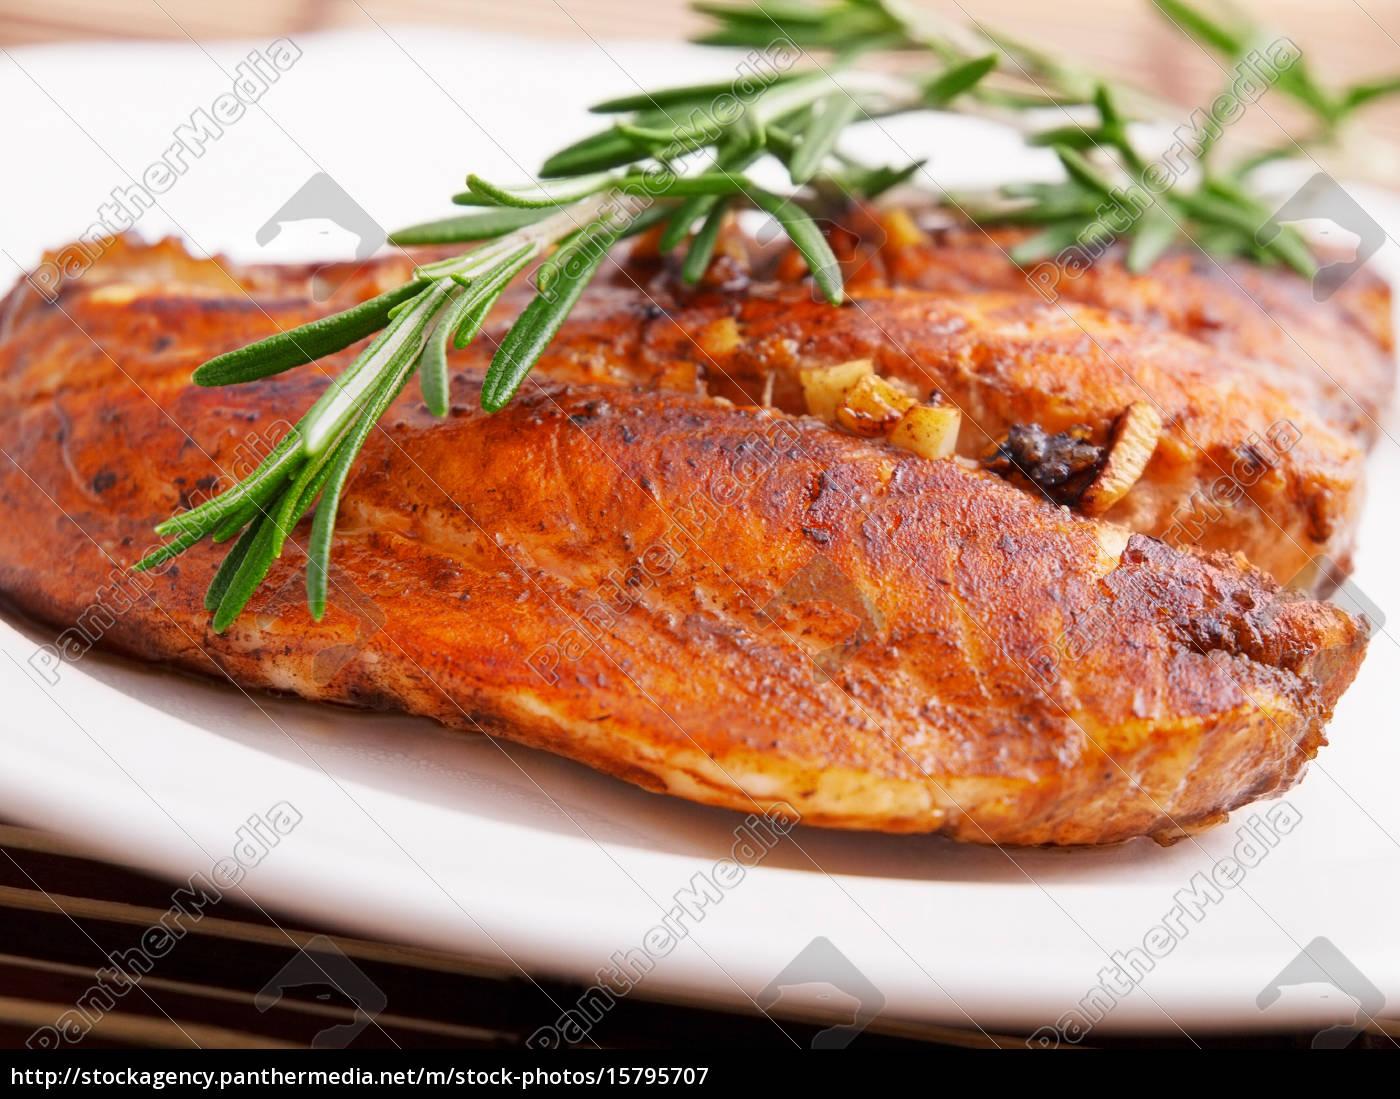 baked, salmon, baked, salmon, baked, salmon, baked, salmon - 15795707